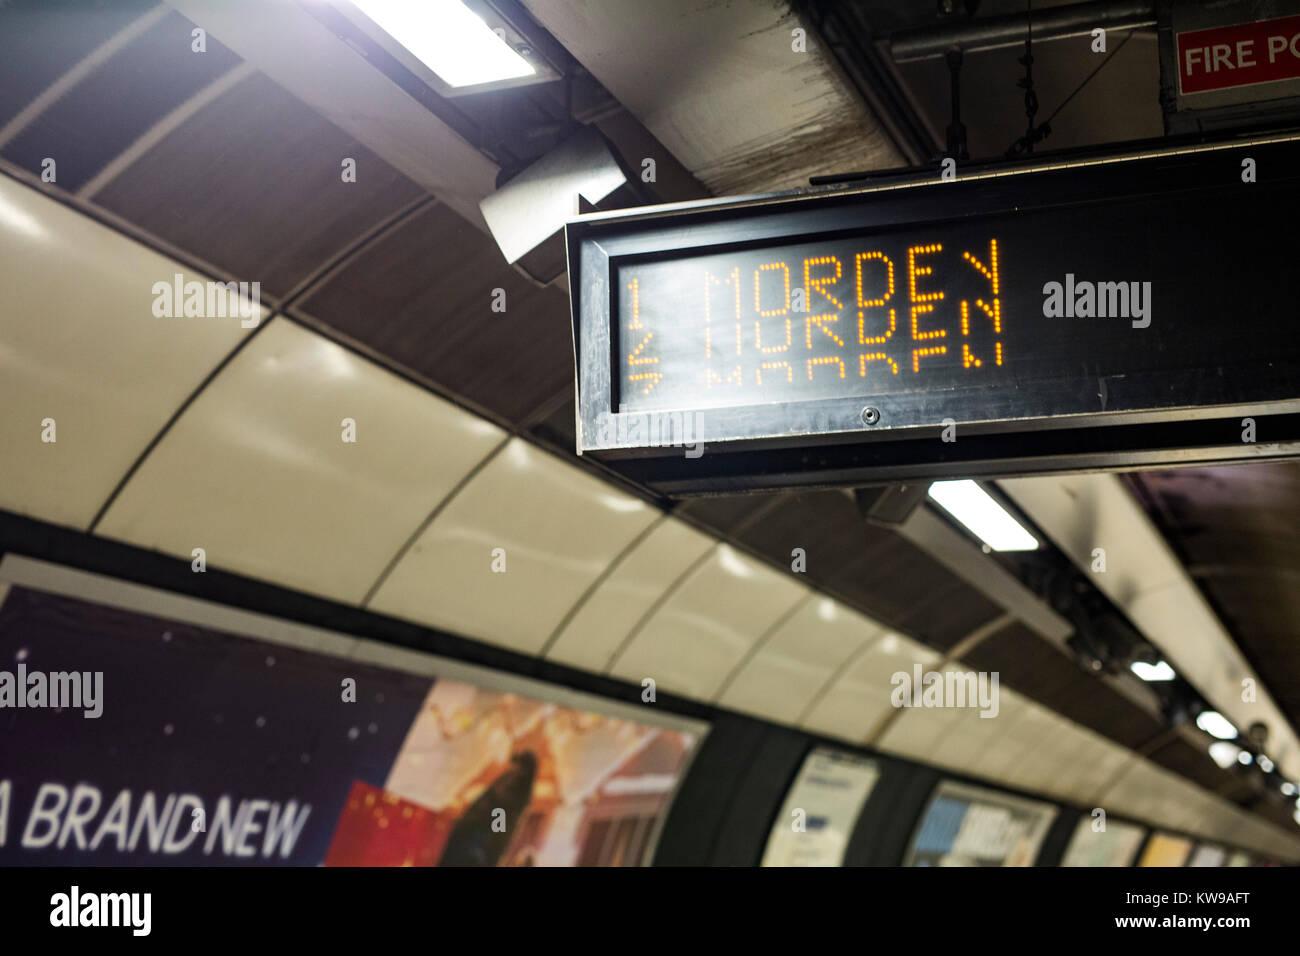 Information boards at southbound Northern line platform at London Bridge station displaying 'Morden' as - Stock Image